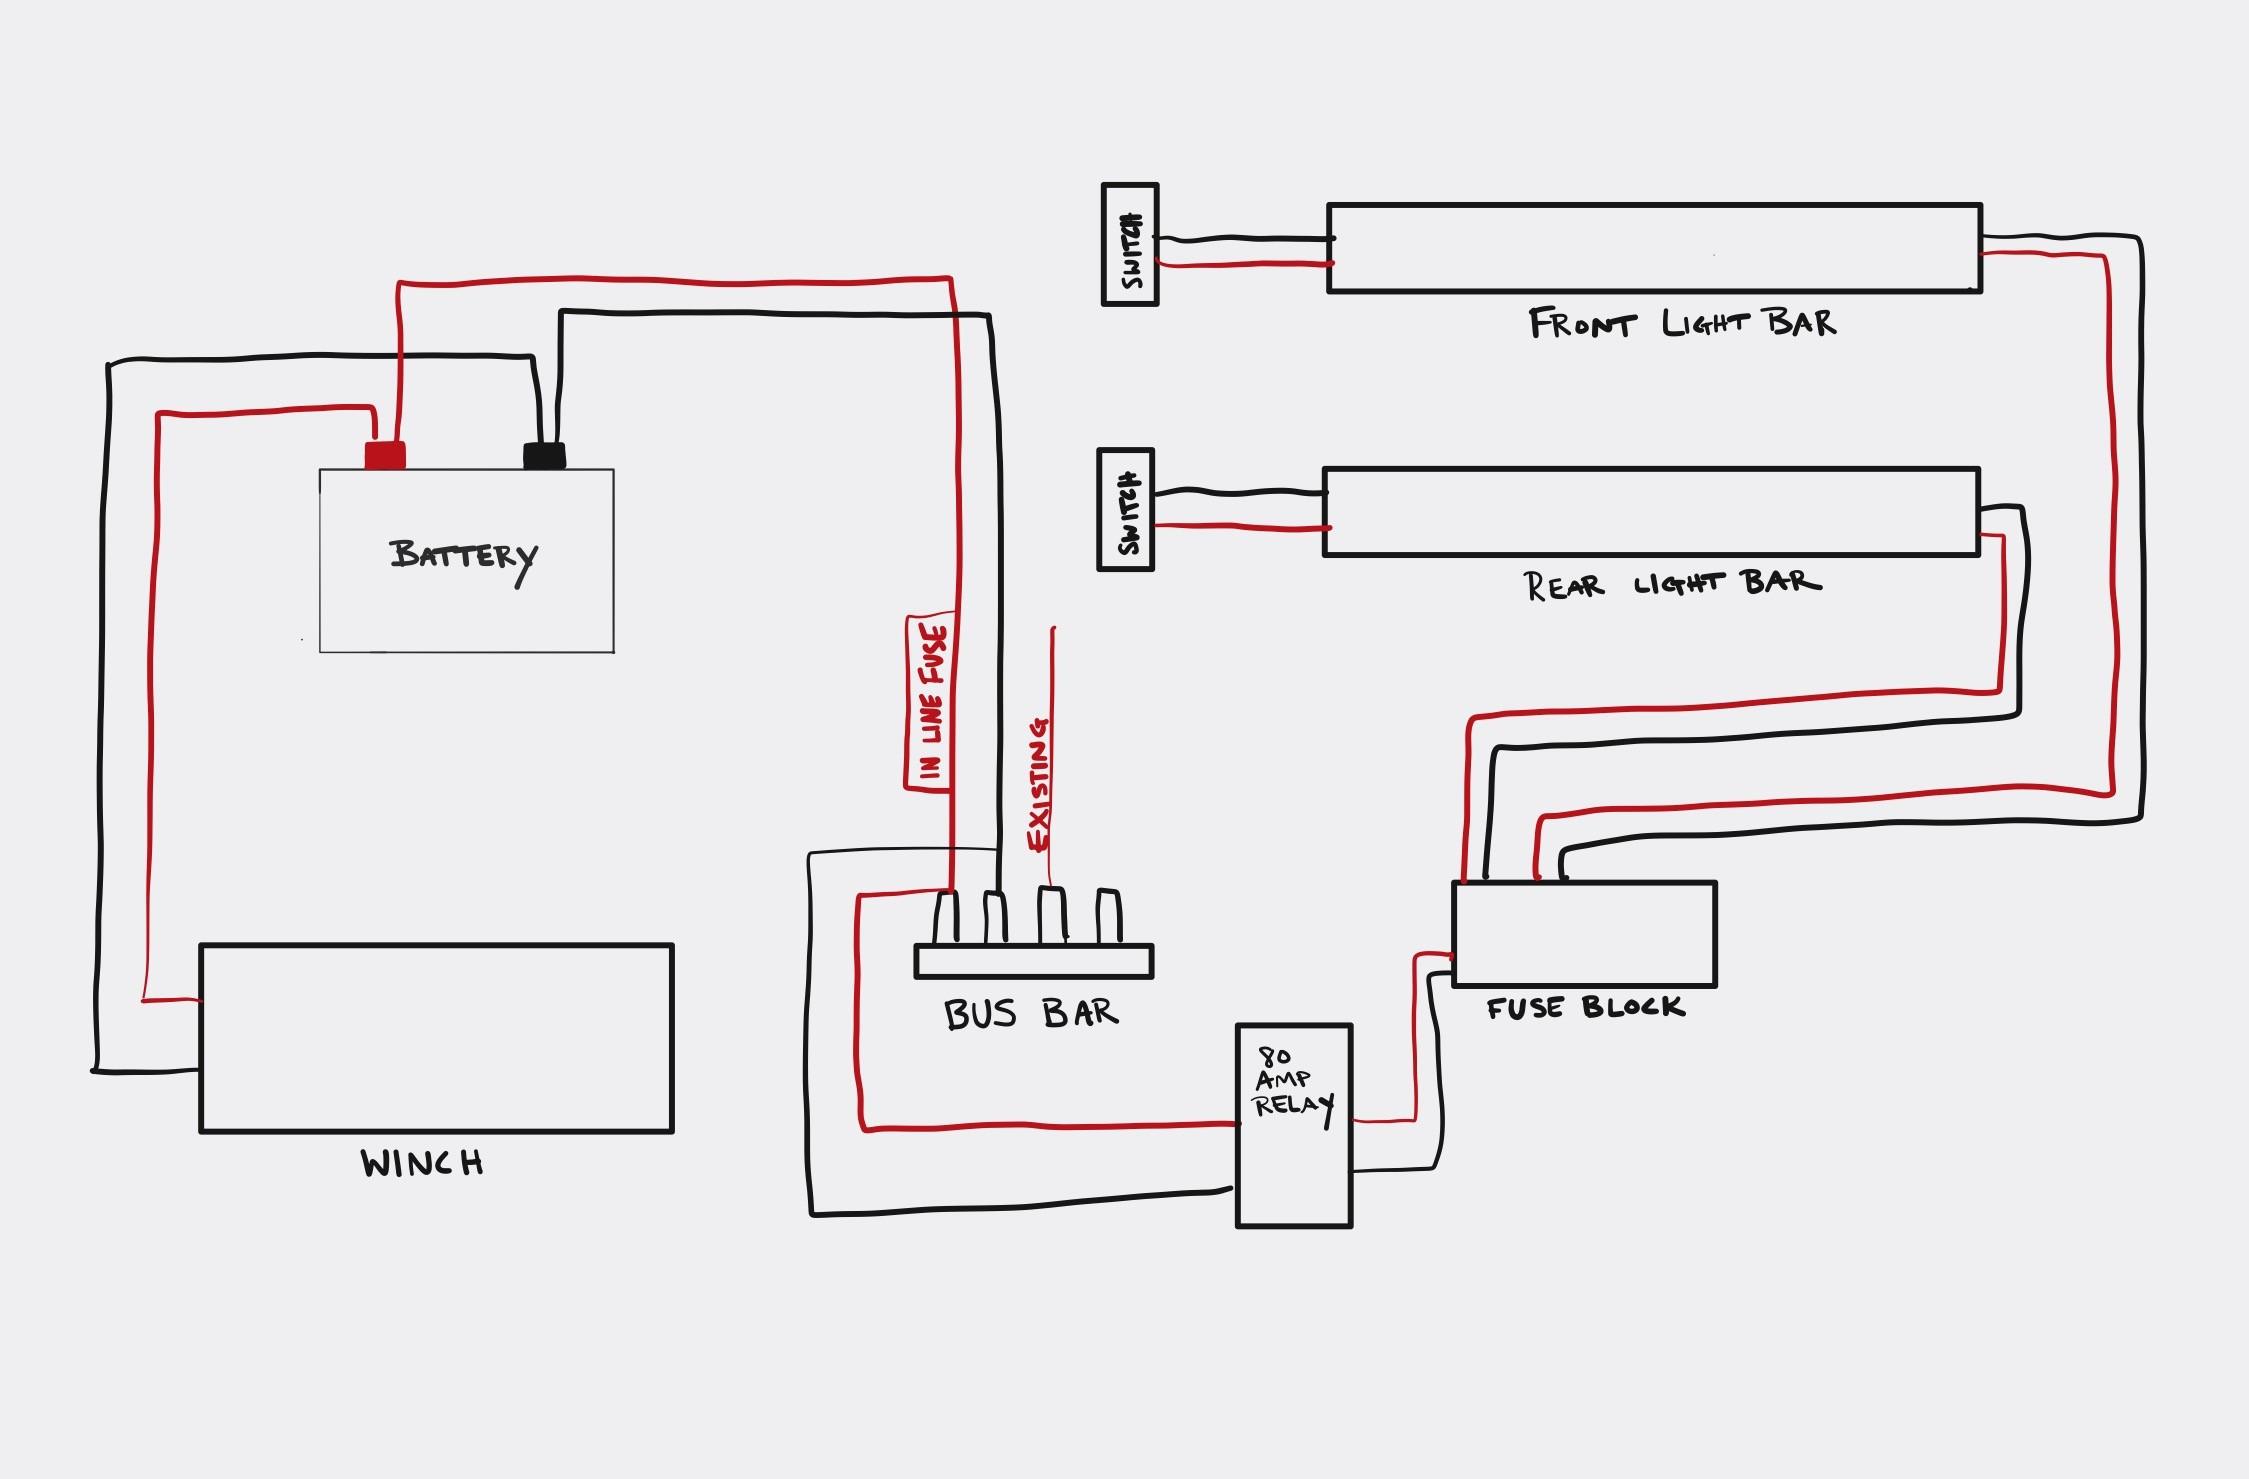 rheem air conditioner wiring diagram nl 9568  ruud wiring diagrams wiring diagram  ruud wiring diagrams wiring diagram